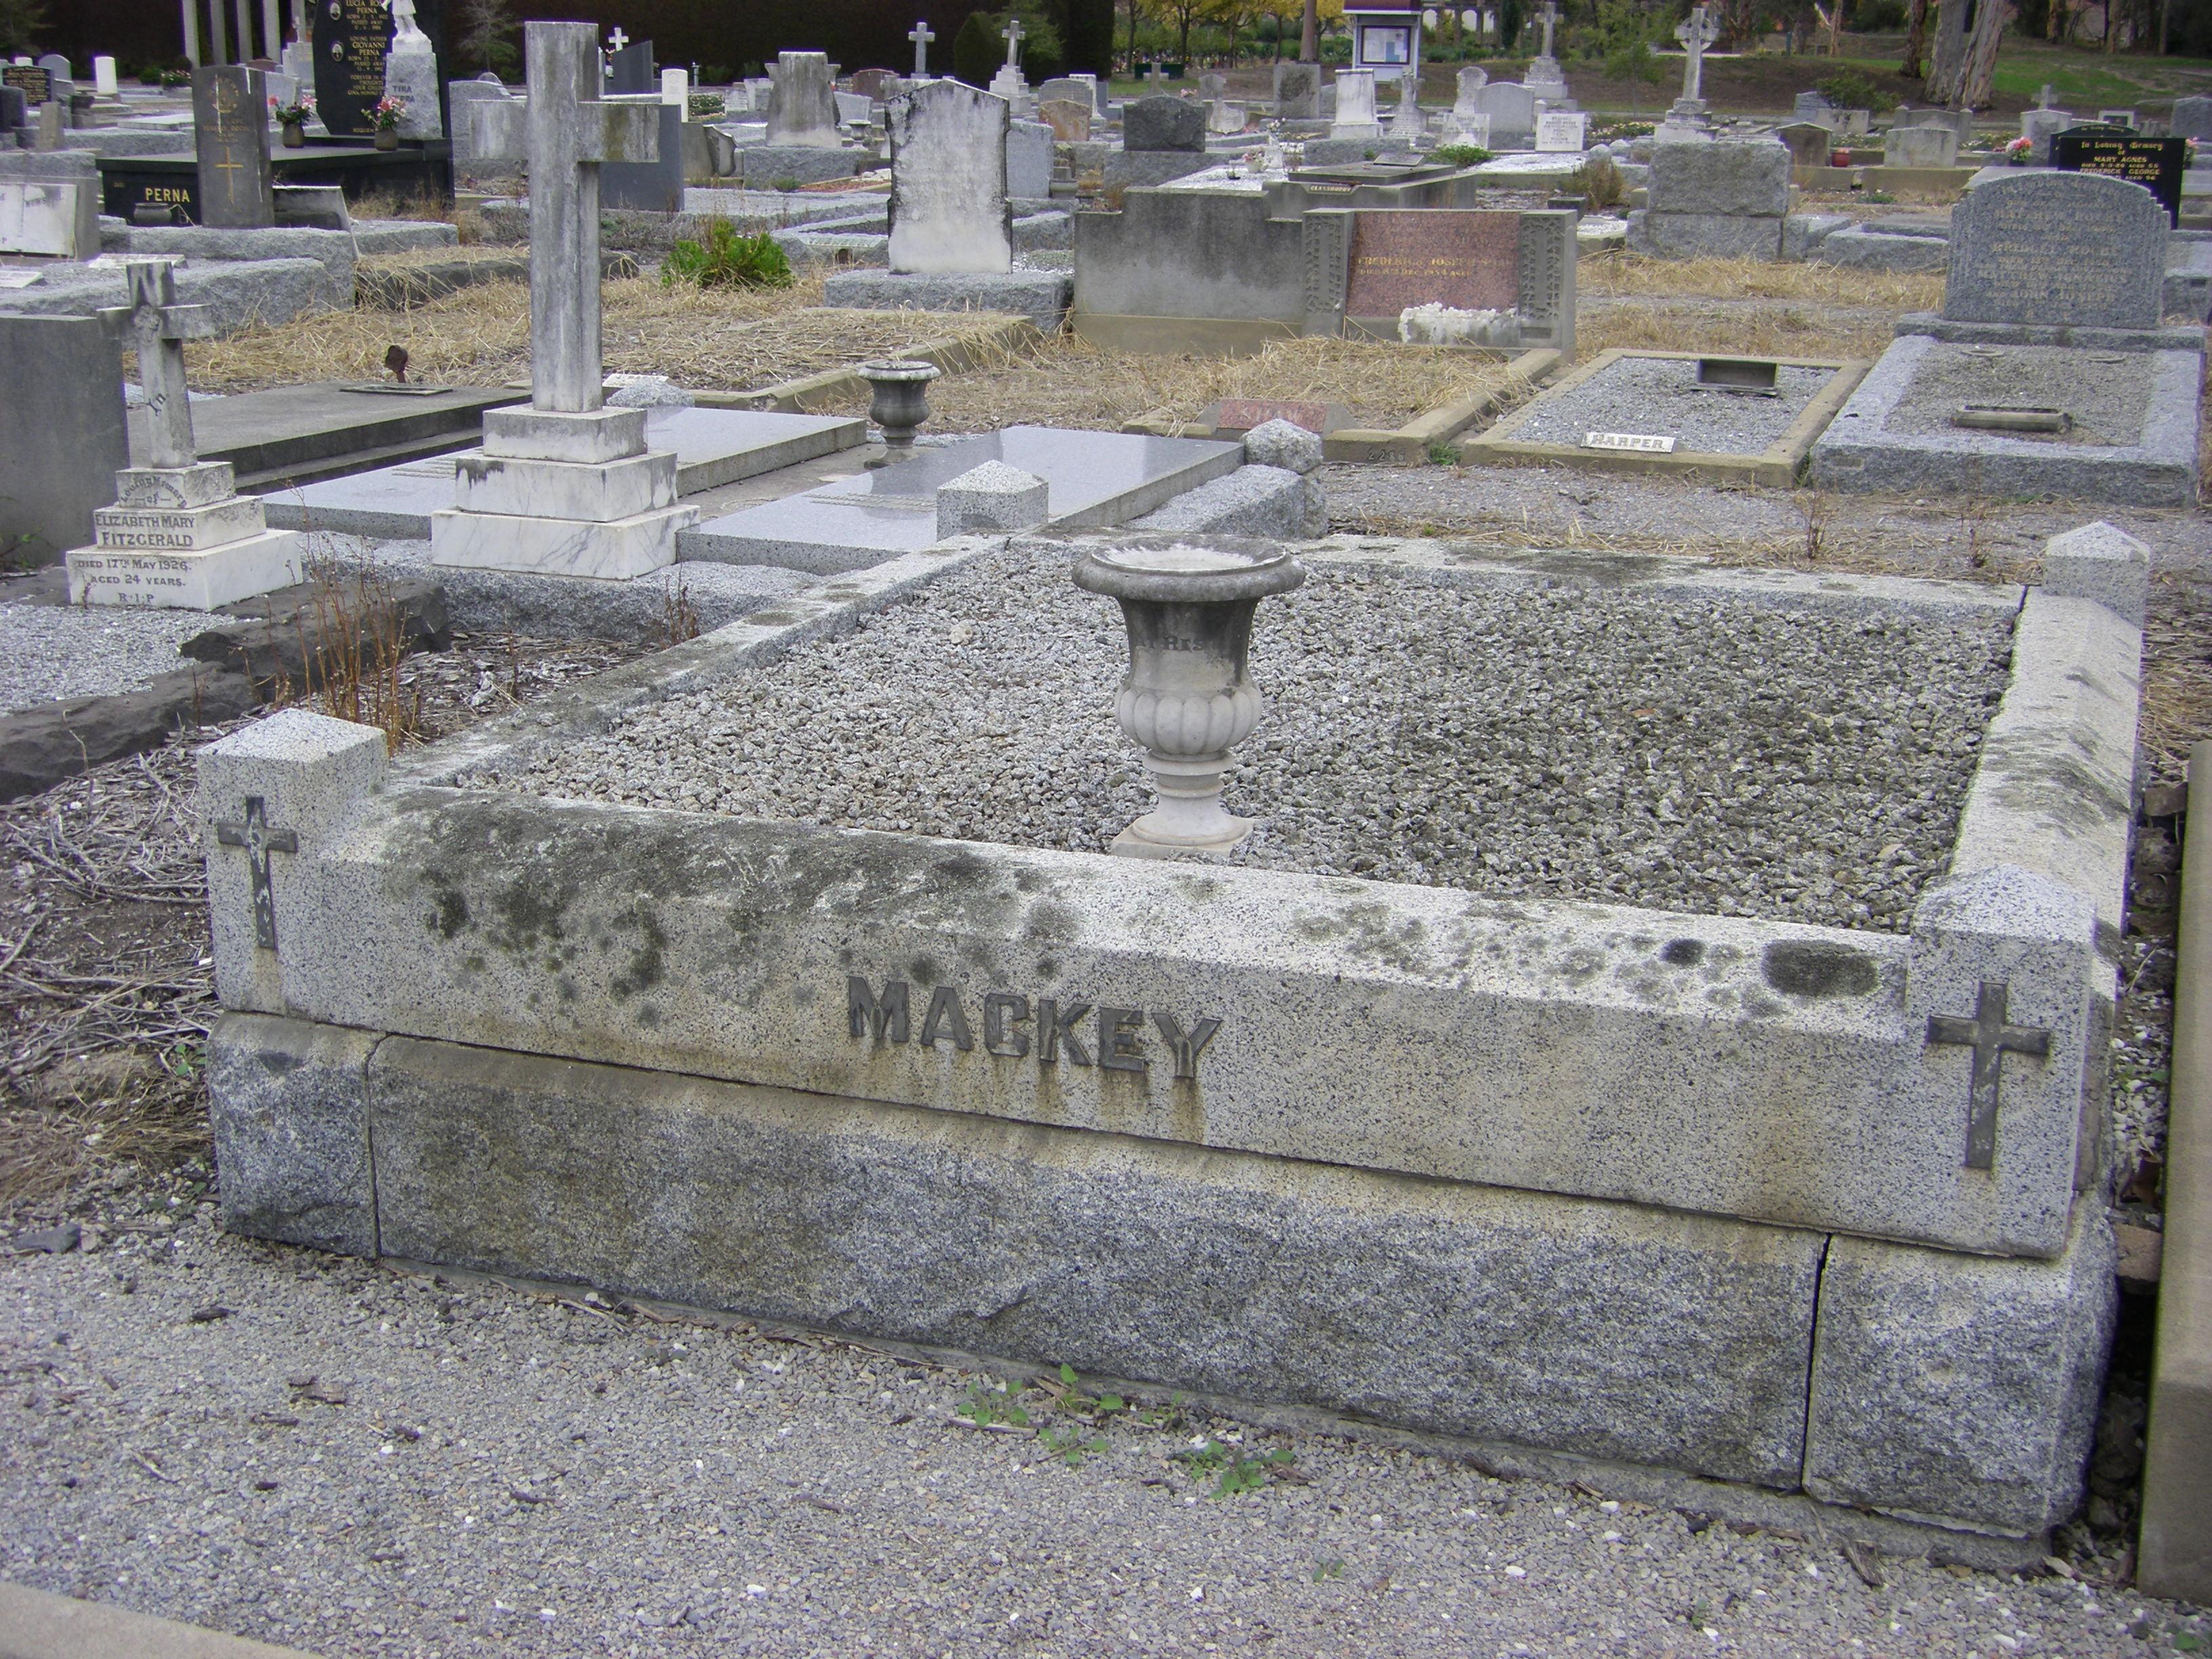 Mackey Grave Fawkner Cem.